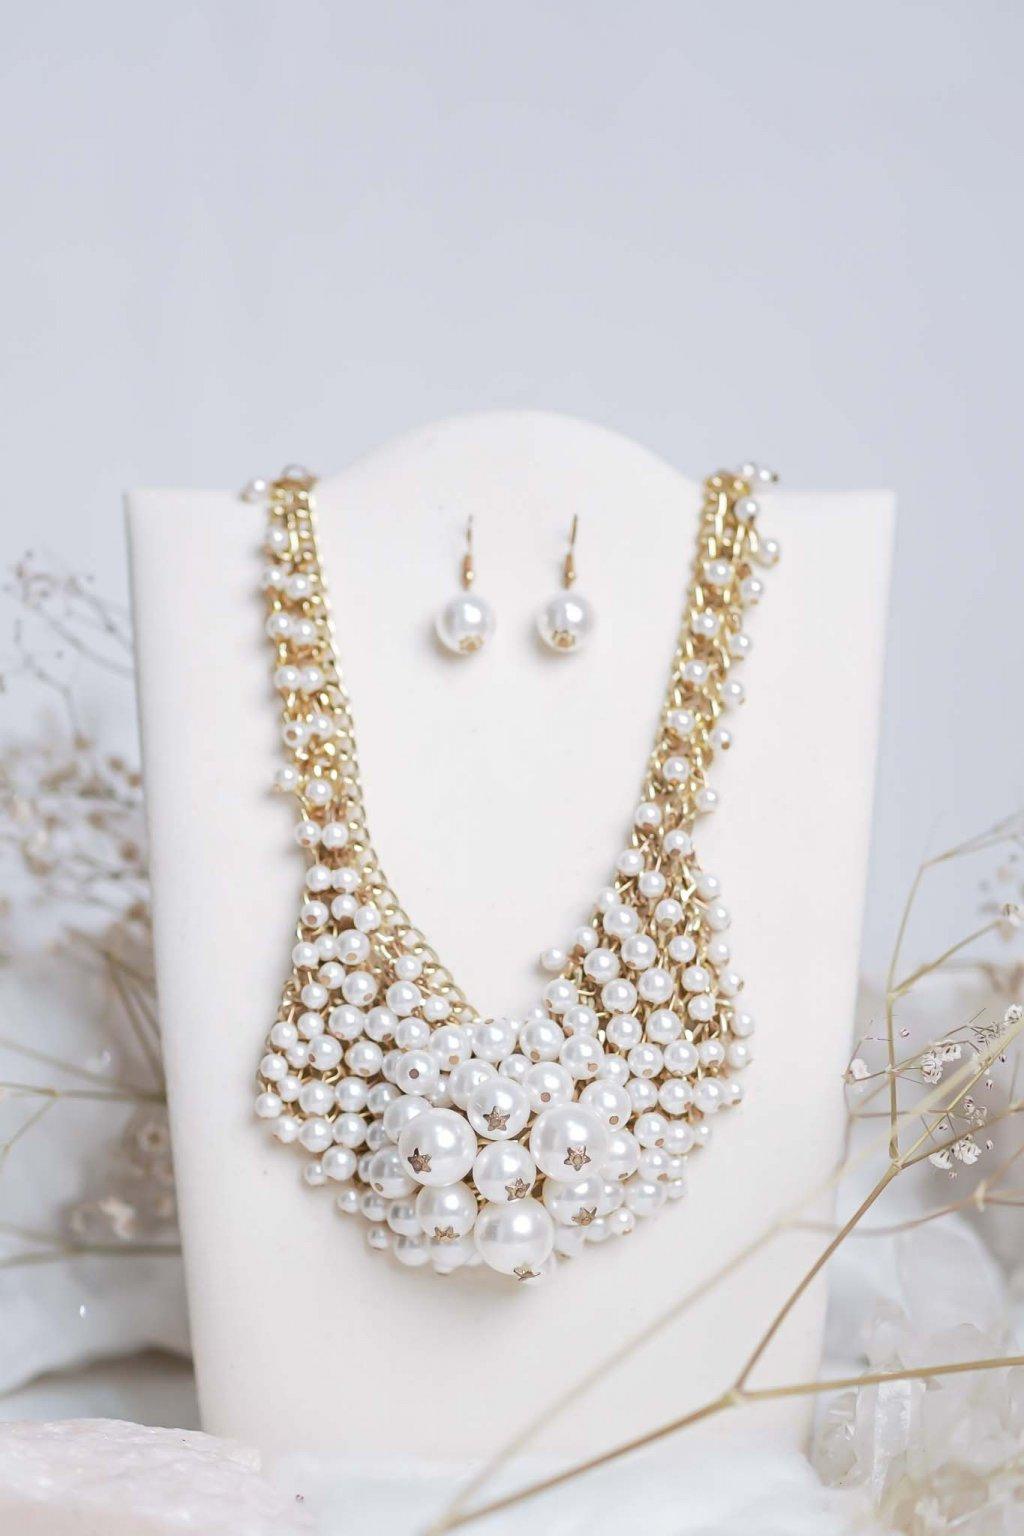 náhrdelník, šperk, spoločenská náhrdelník, náhrdelník na bežný deň, výrazný náhrdelník, jemný náhrdelník, šperky, náhrdelník na ples, svadbu, stužkovú 24